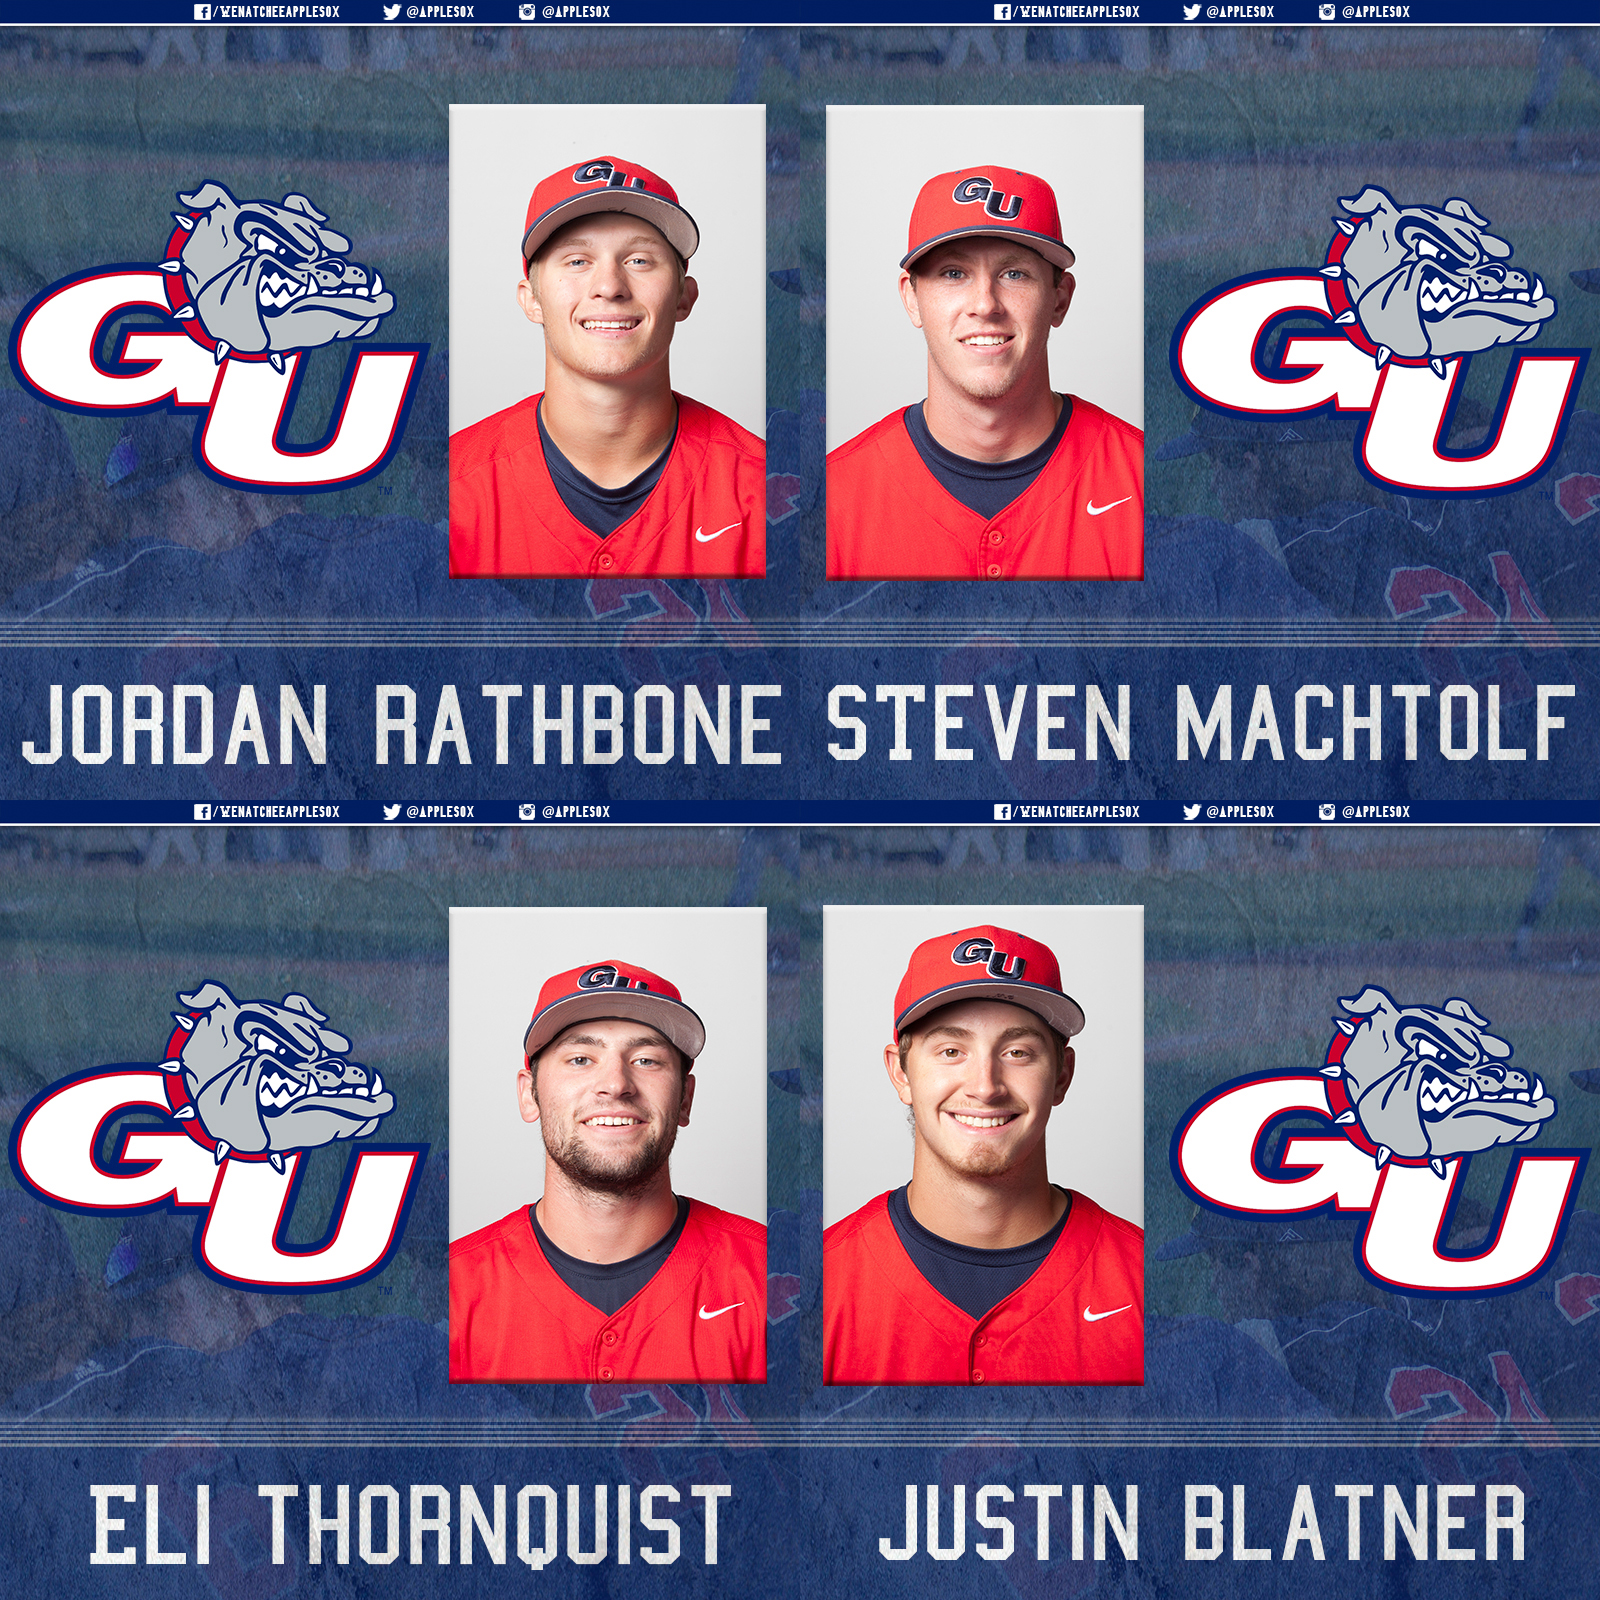 Current Gonzaga Bulldogs Left-handed pitcher Eli Thornquist, left-handed pitcher Justin Blatner, catcher/outfielder Jordan Rathbone, and infielder Steve Machtolf will don AppleSox uniforms this season.